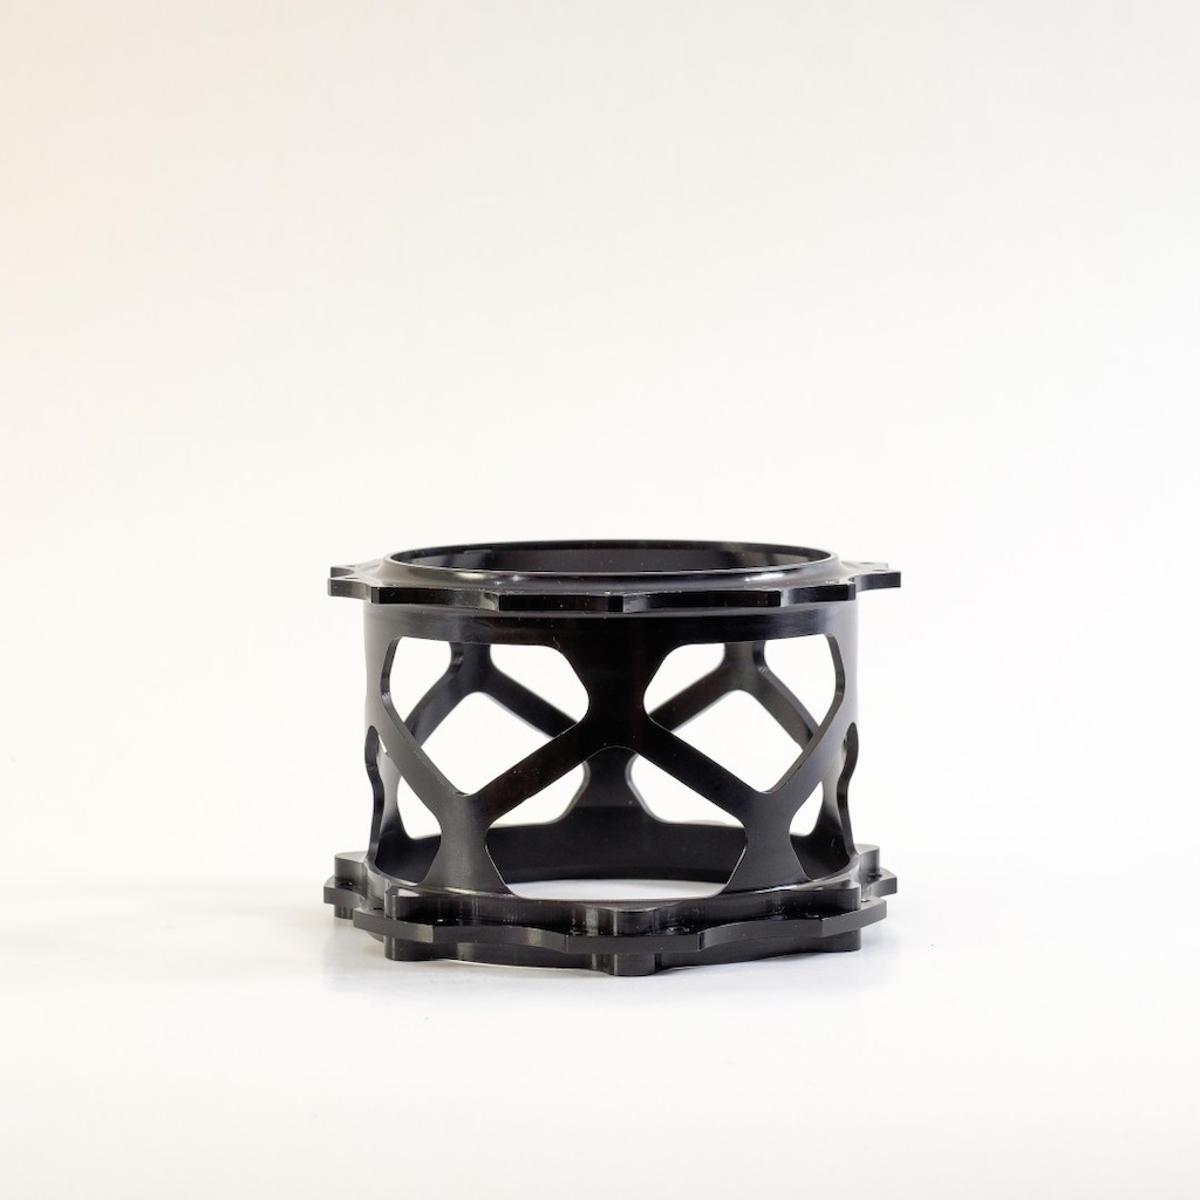 kindernay-xiv-14-speed-internal-hub-6